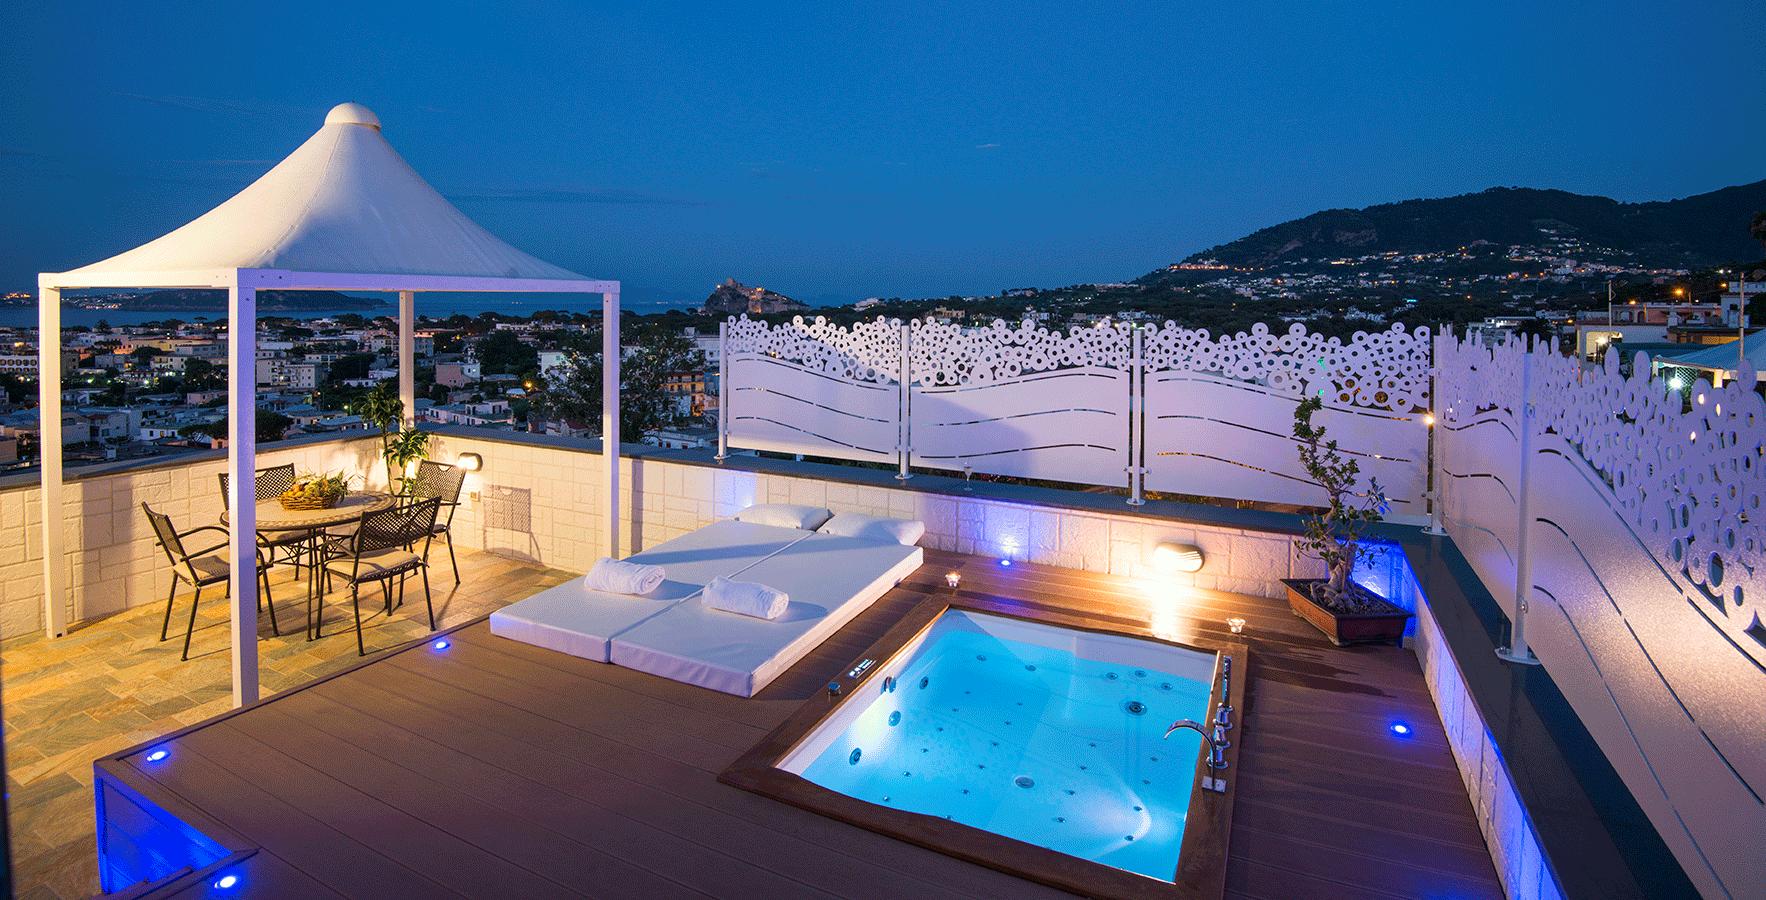 Offerte Ischia Hotel, Pacchetti Vacanze Ischia, Alberghi Last ...